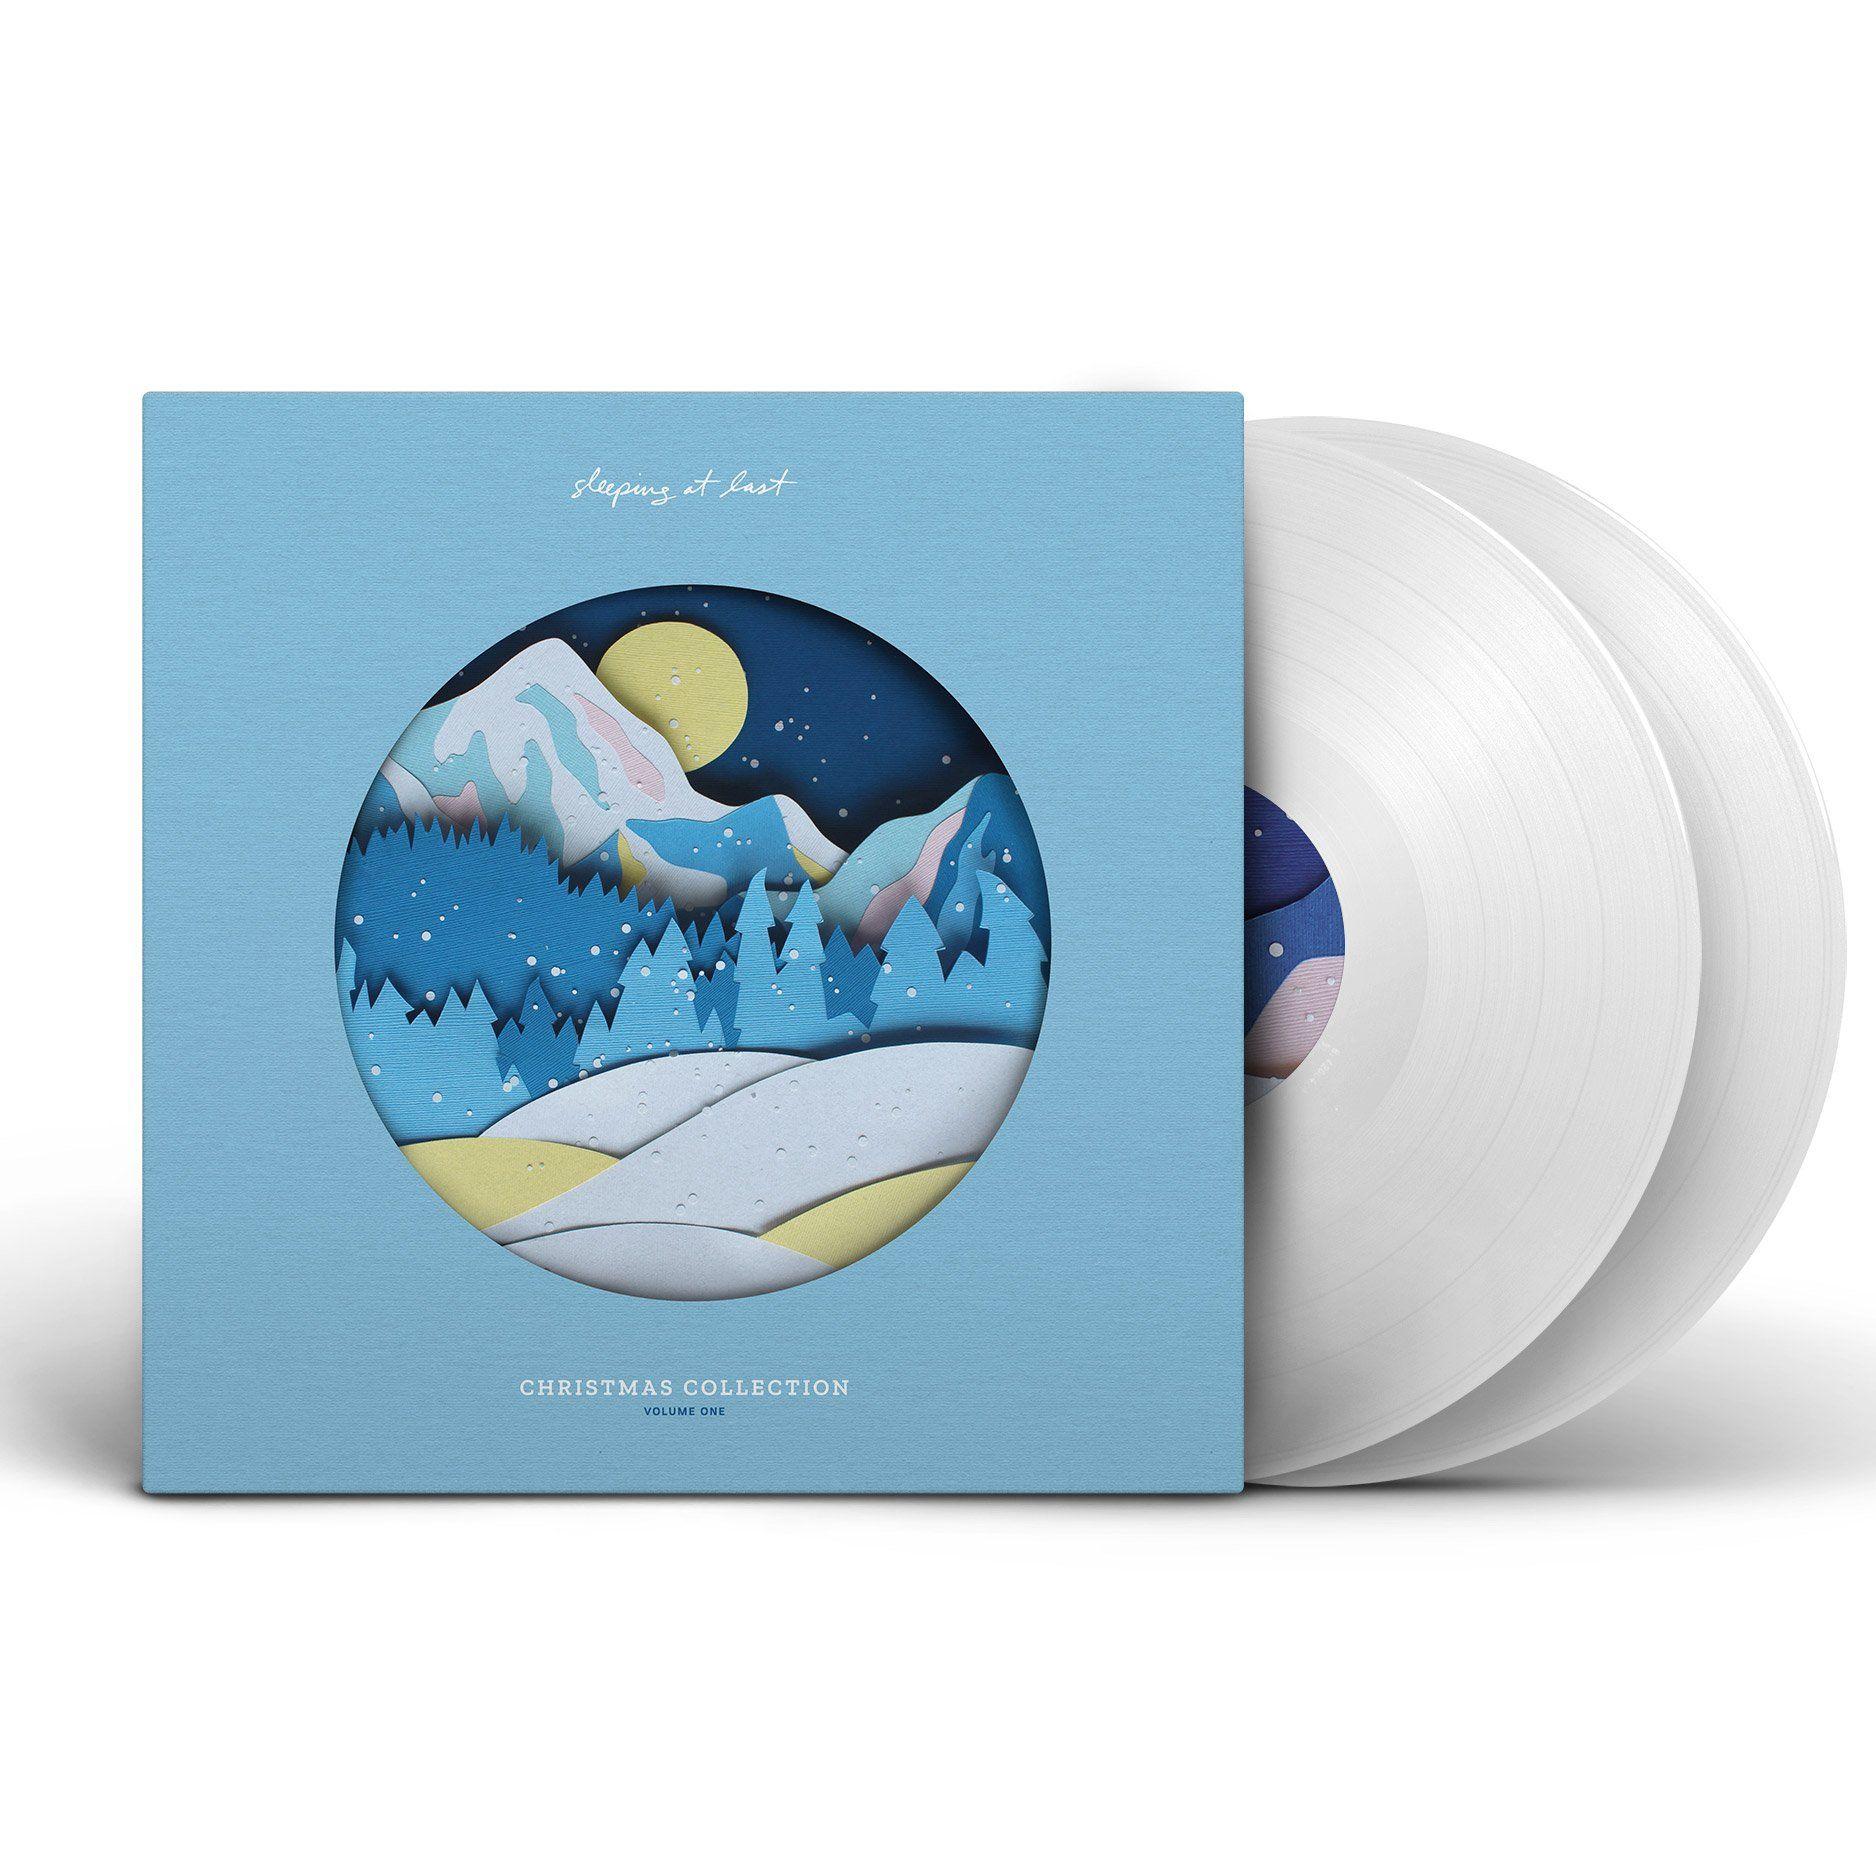 Sleeping At Last Christmas Collection On Vinyl 30 Sleeping At Last Christmas Vinyl Vinyl